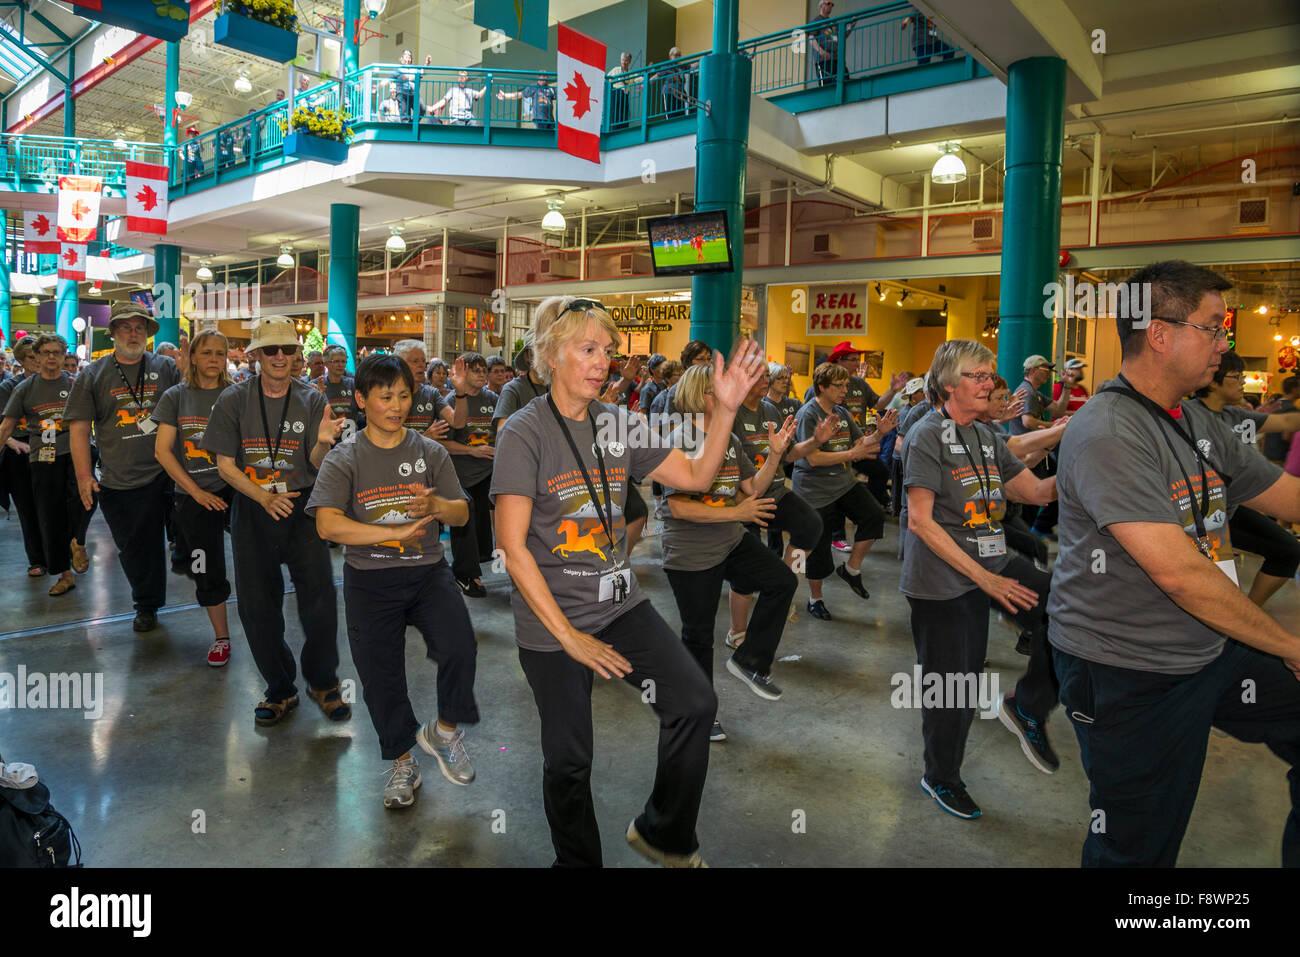 Tai Chi demonstration, Eau Claire Calgary, Alberta, Canada - Stock Image